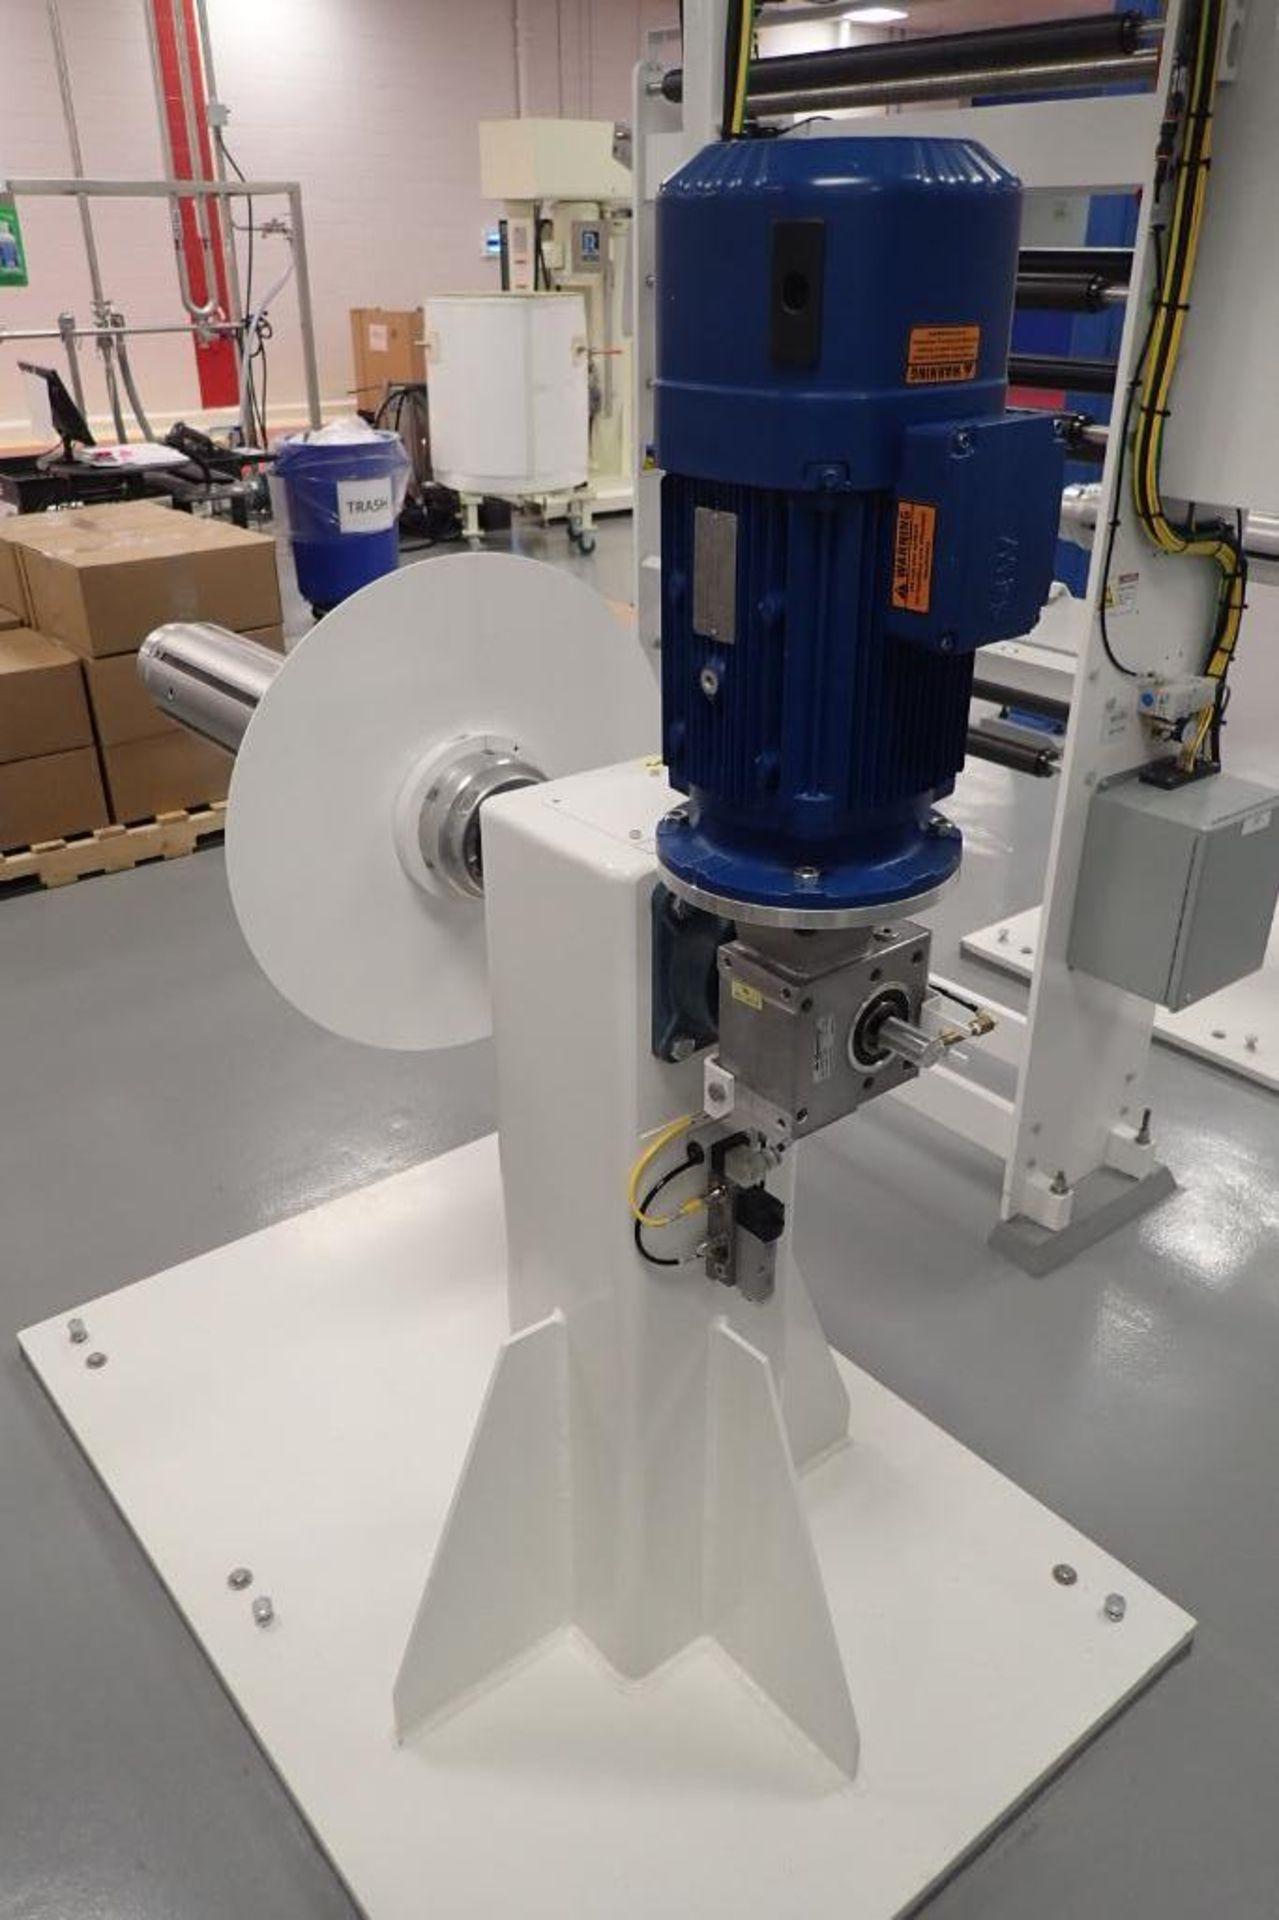 Lot 8 - Paper Converting Machine Company Marlin Flex 4-lane crossfolder wet wipe line, Barry-Wehmiller